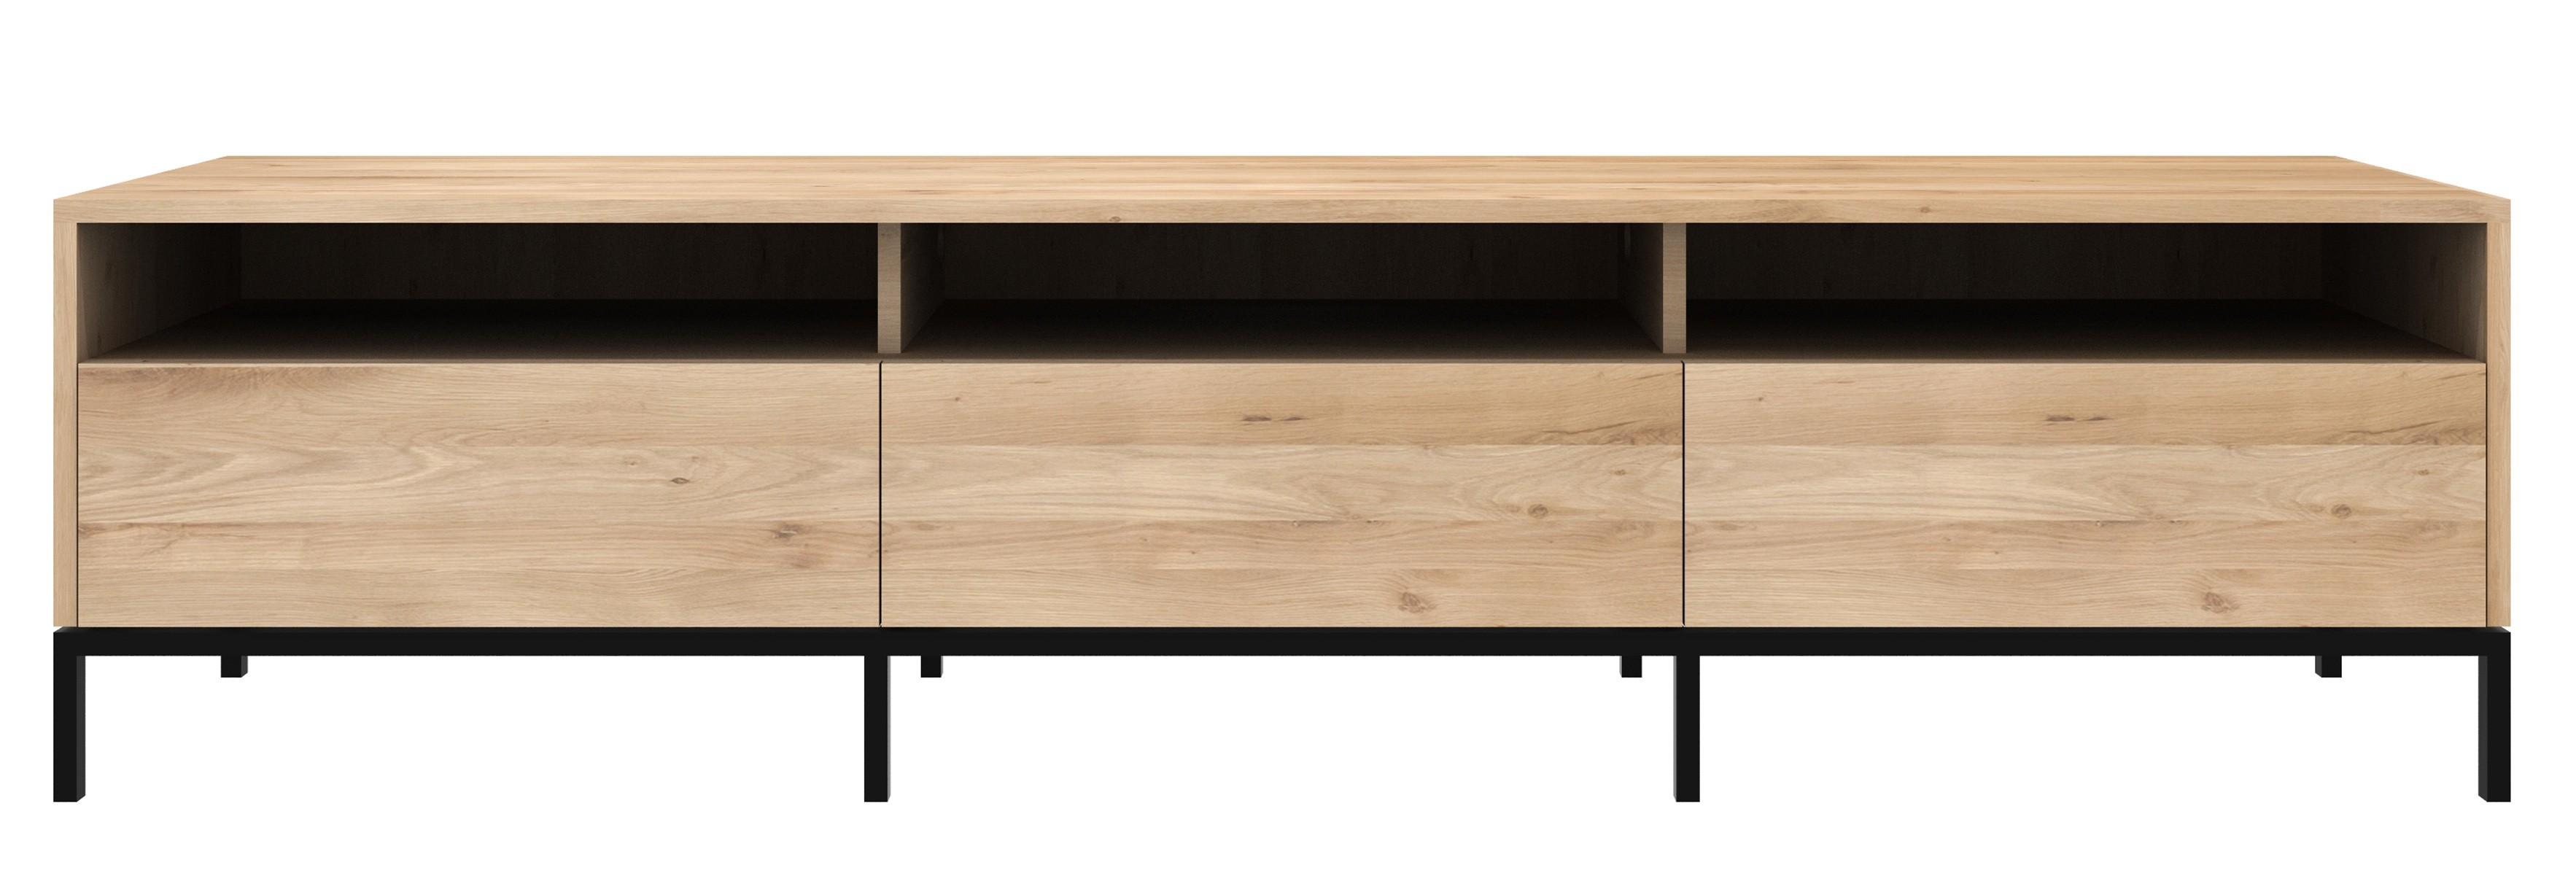 Meuble Tv Grande Taille meuble tv ligna d'ethnicraft, 2 tailles, chêne